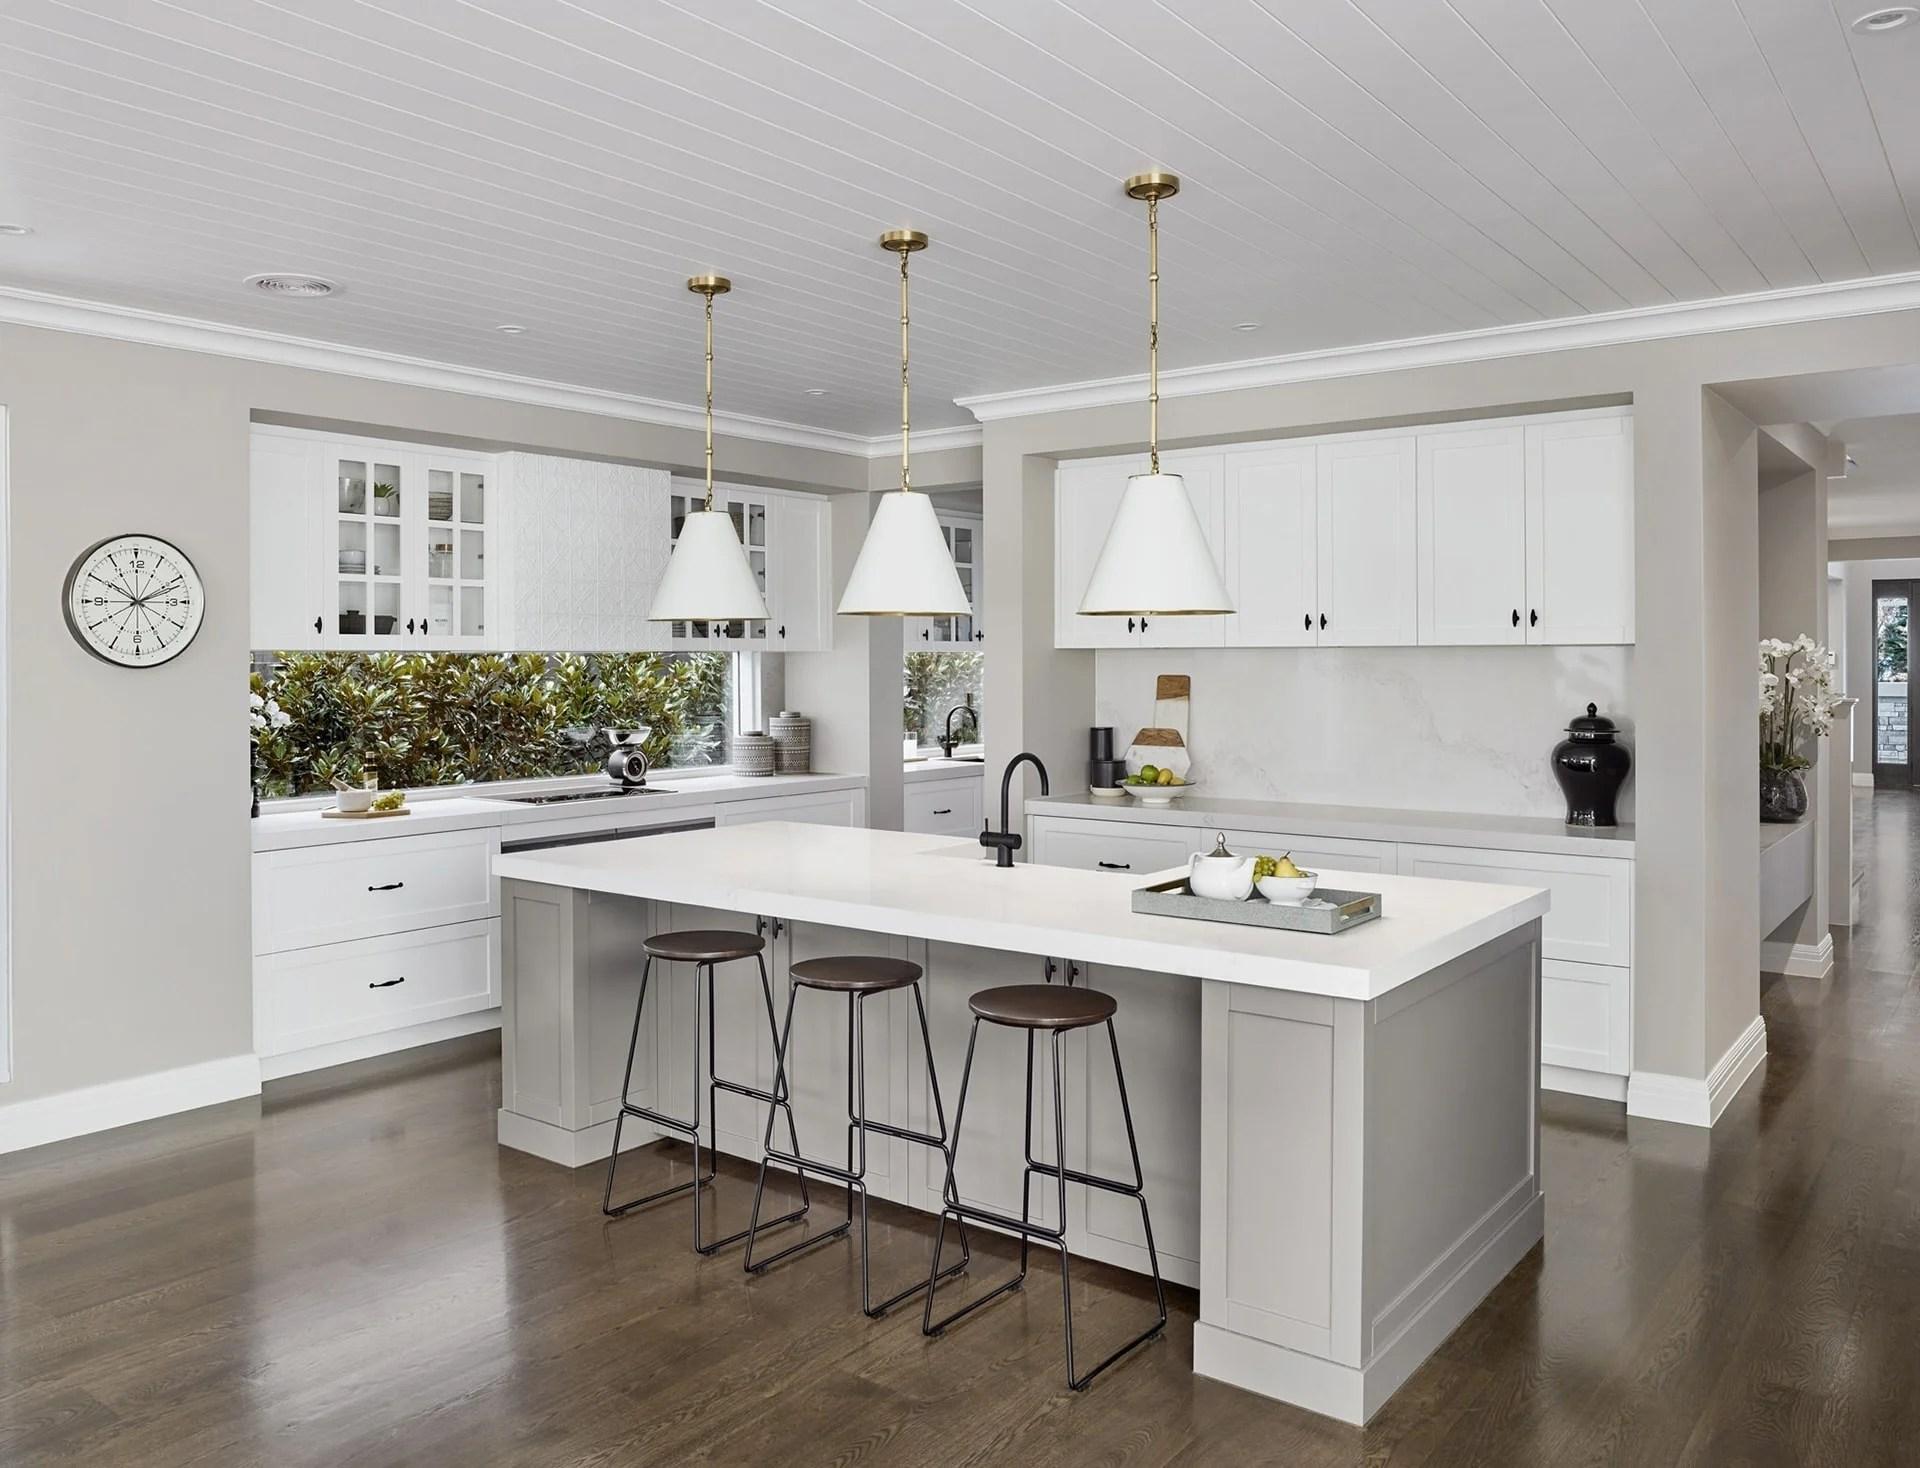 Budget Kitchen Makeover Ideas 7 Easy Updates Tlc Interiors